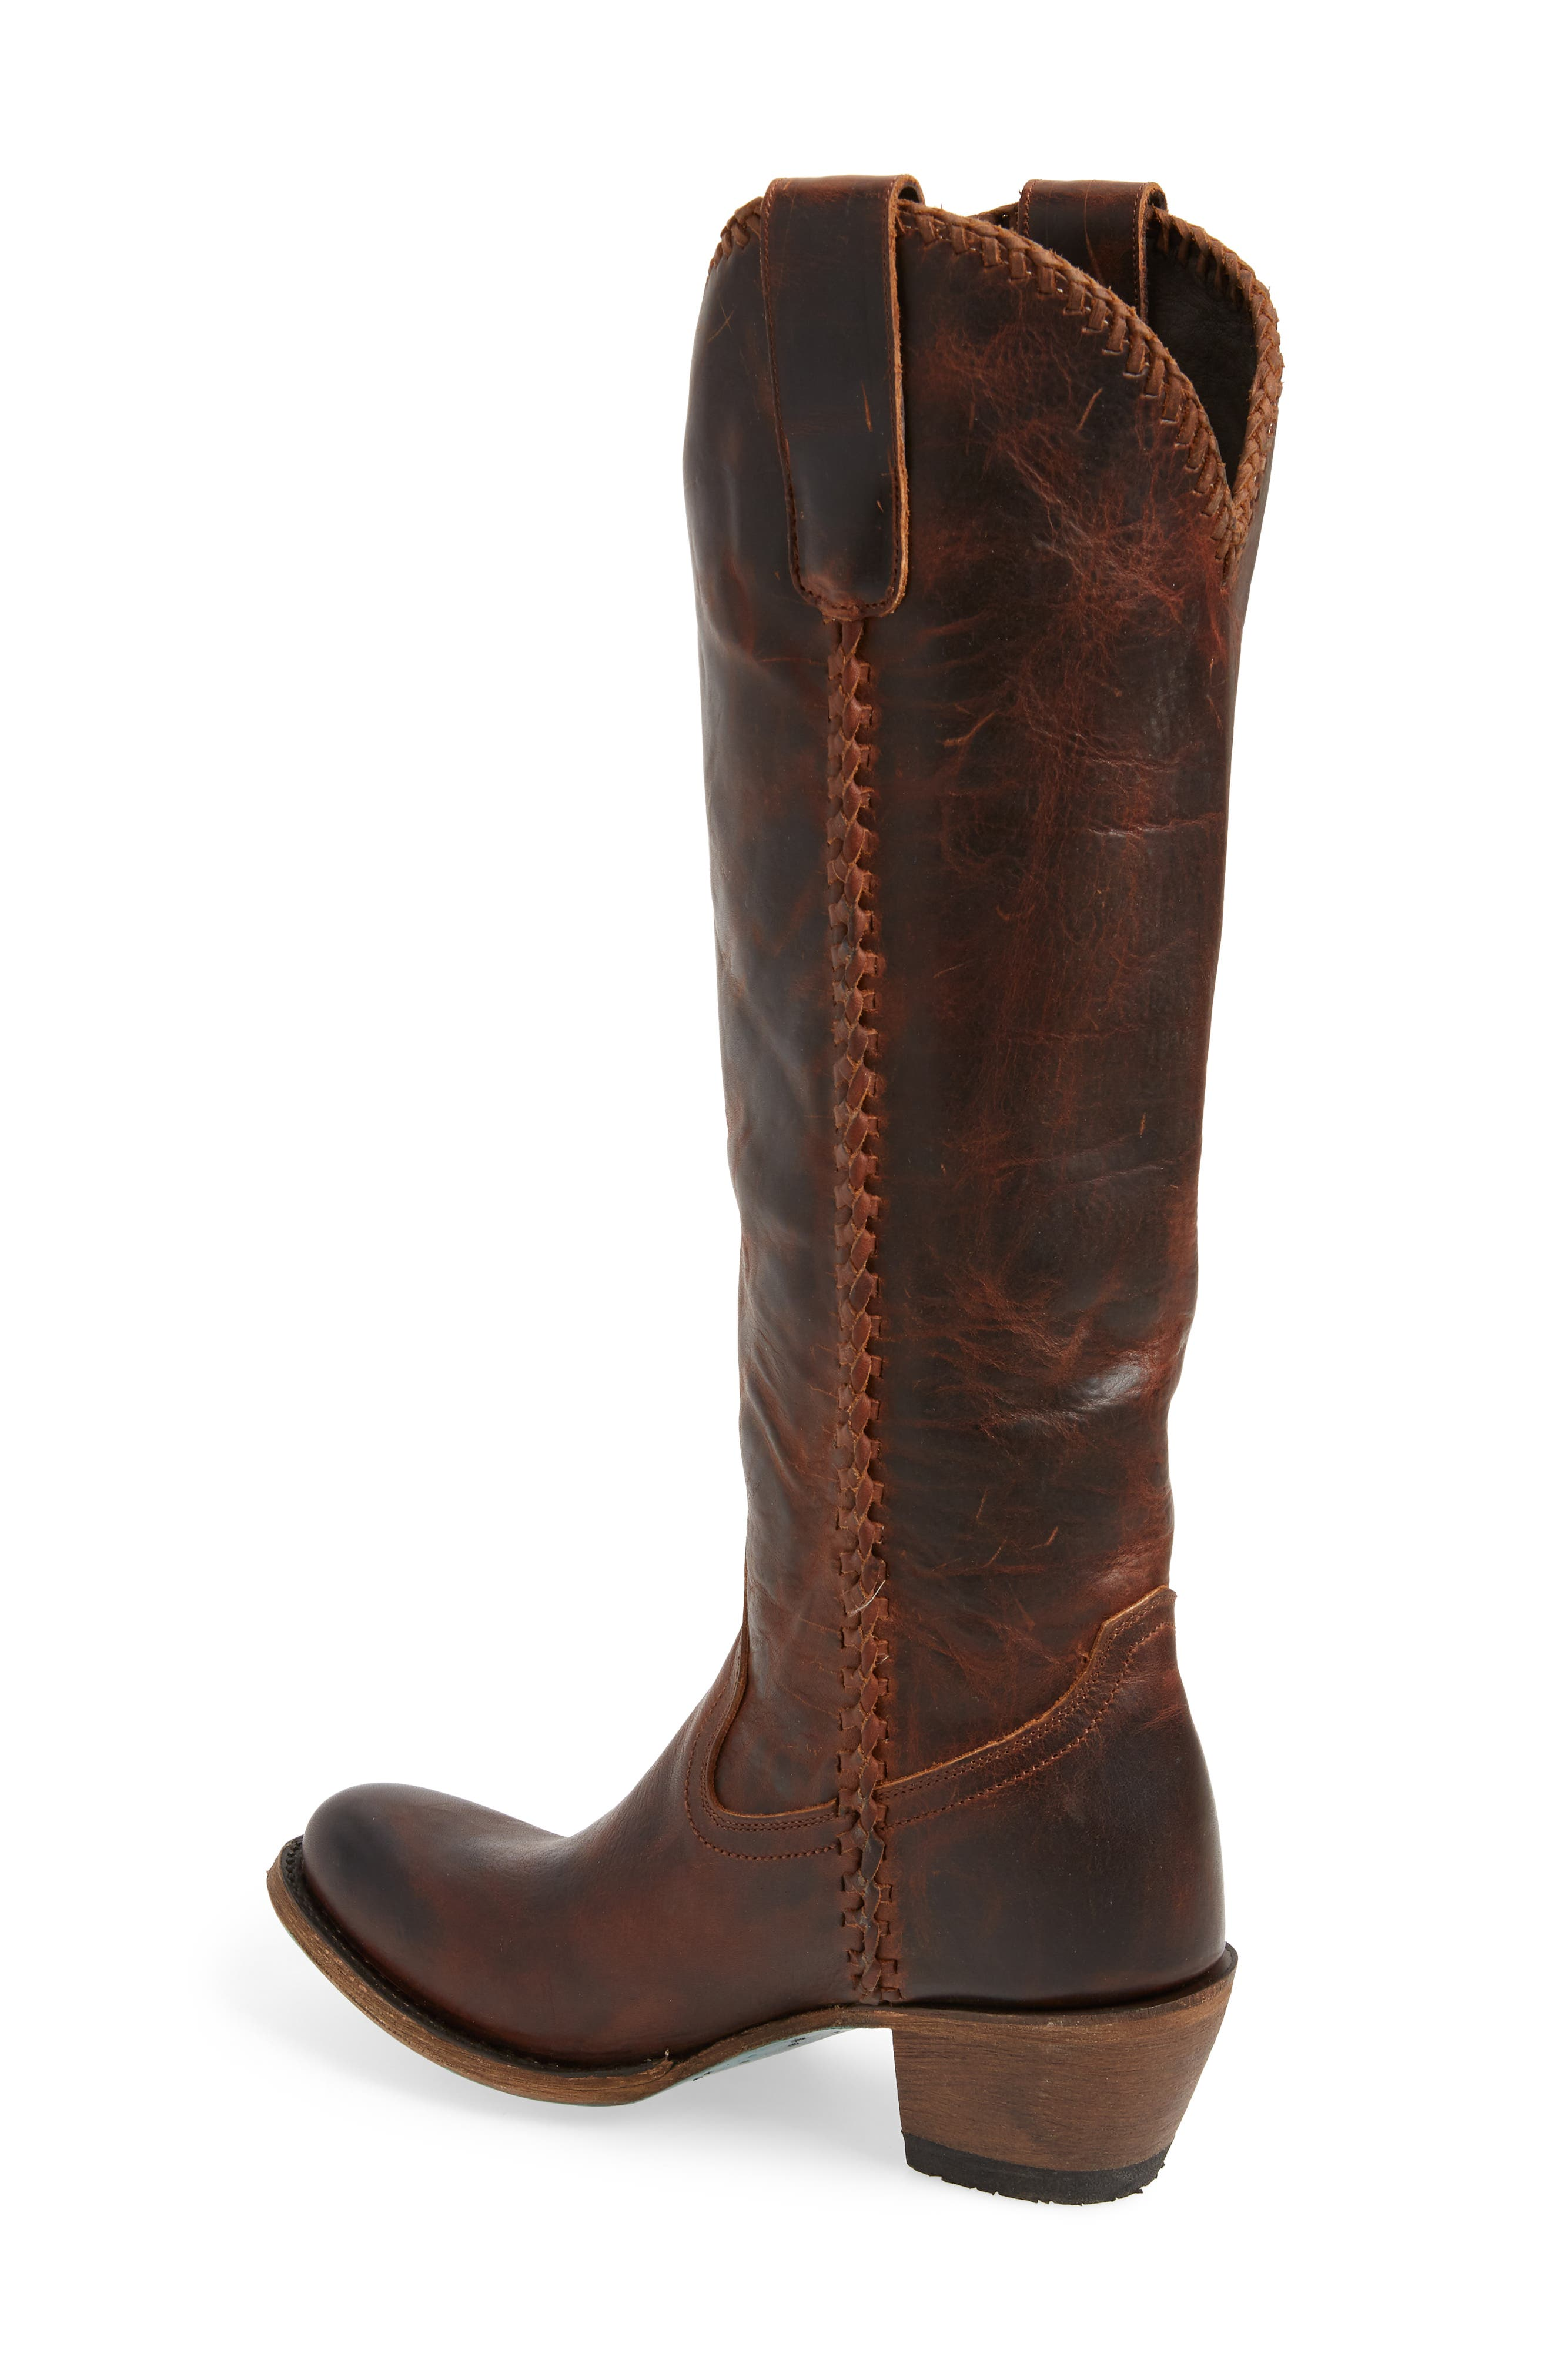 LANE BOOTS,                             Plain Jane Knee High Western Boot,                             Alternate thumbnail 2, color,                             COGNAC LEATHER